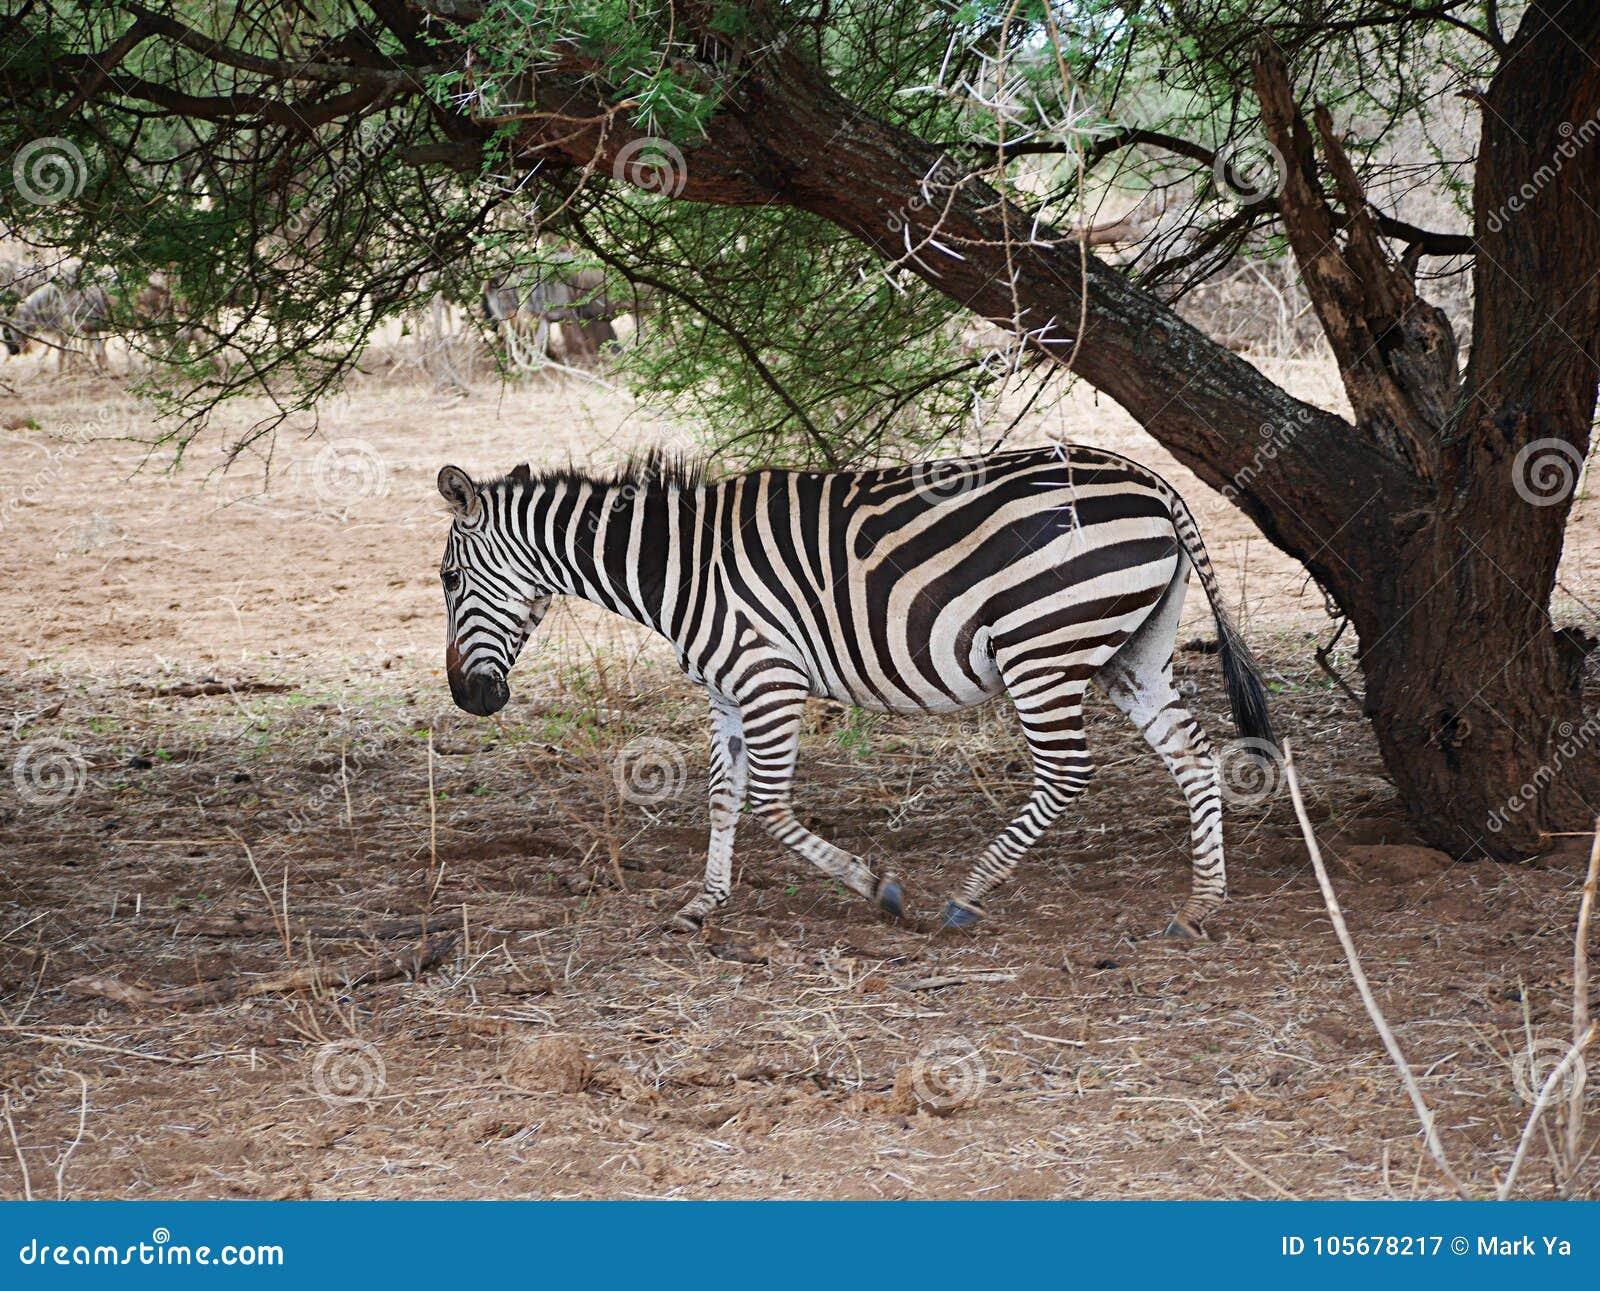 Zebra close-u on Tarangiri safari - Ngorongoro